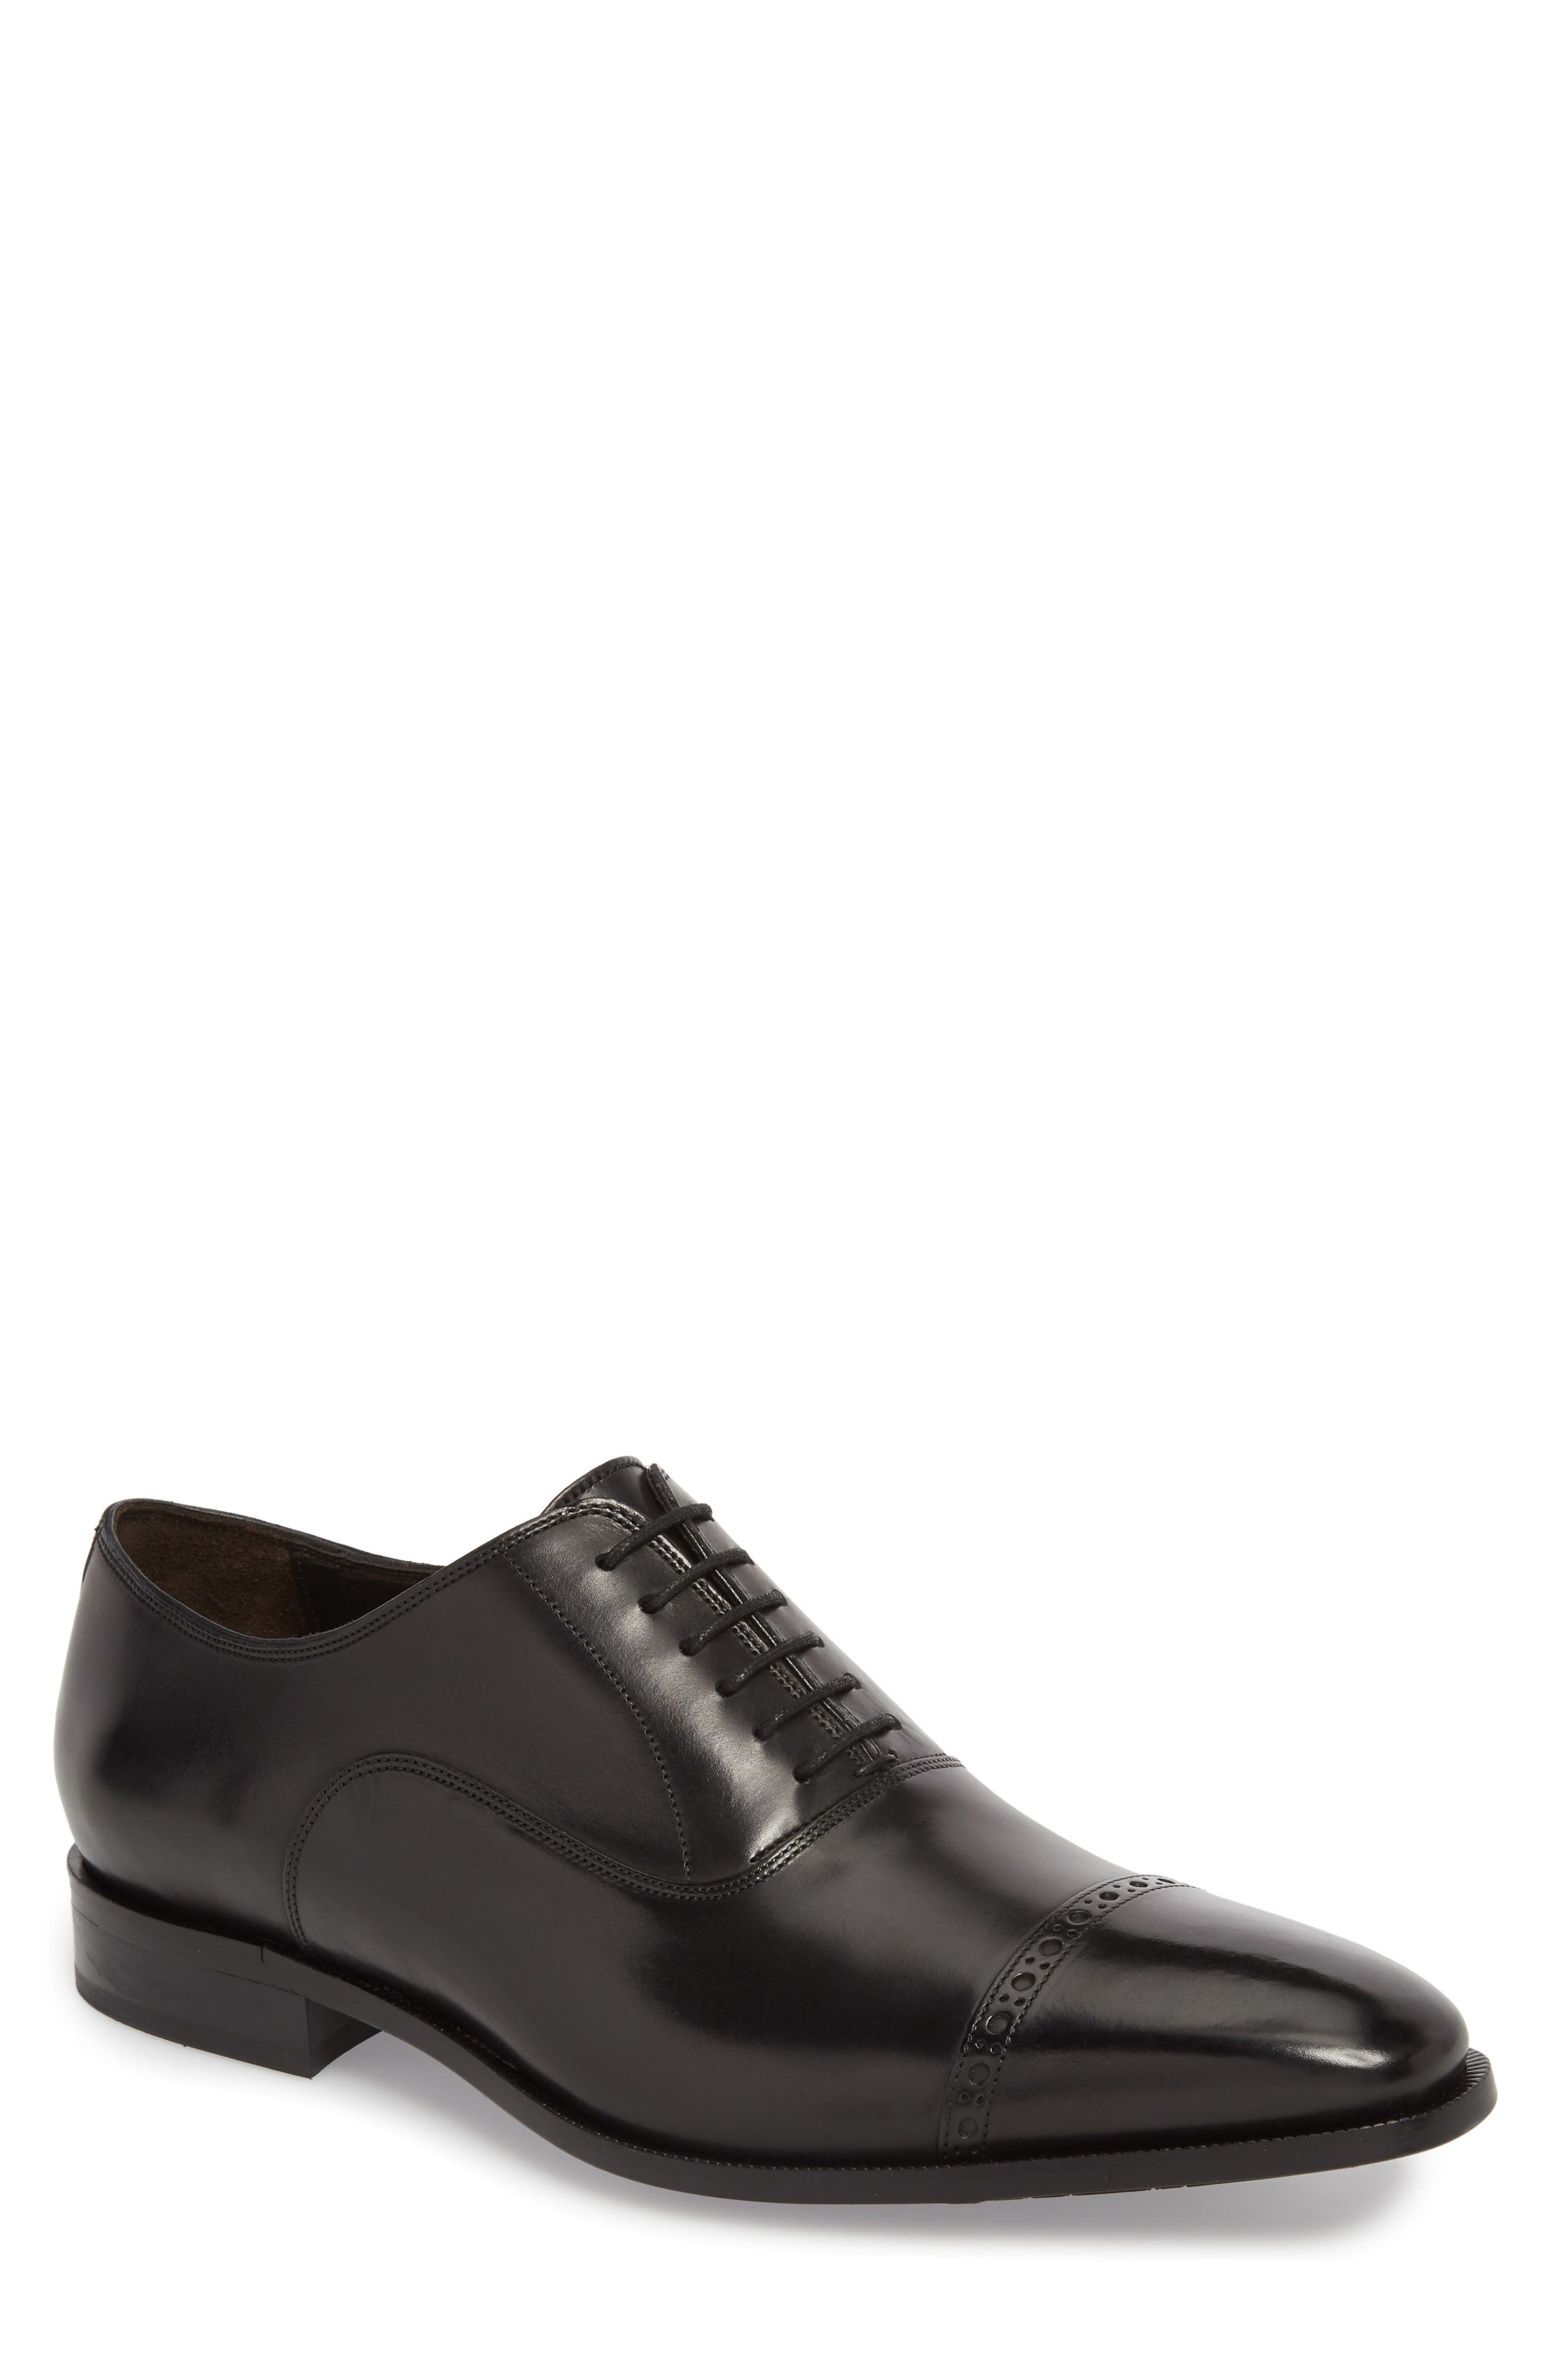 Harding Cap Toe Oxford,                         Main,                         color, PARMA BLACK